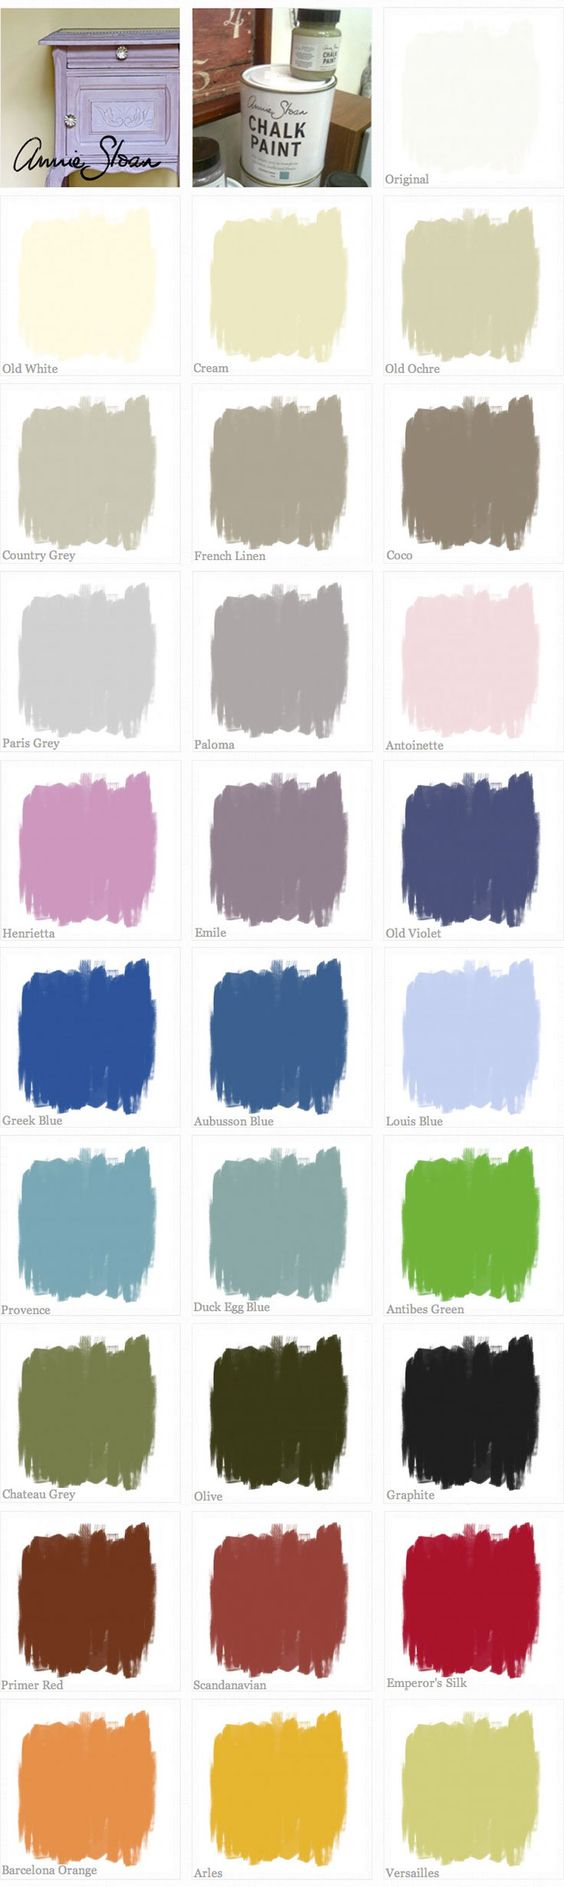 CHALK PAINT :: Annie Sloan Chalk Paint Color Swatches (missing Napoleonic Blue...a dark blue)